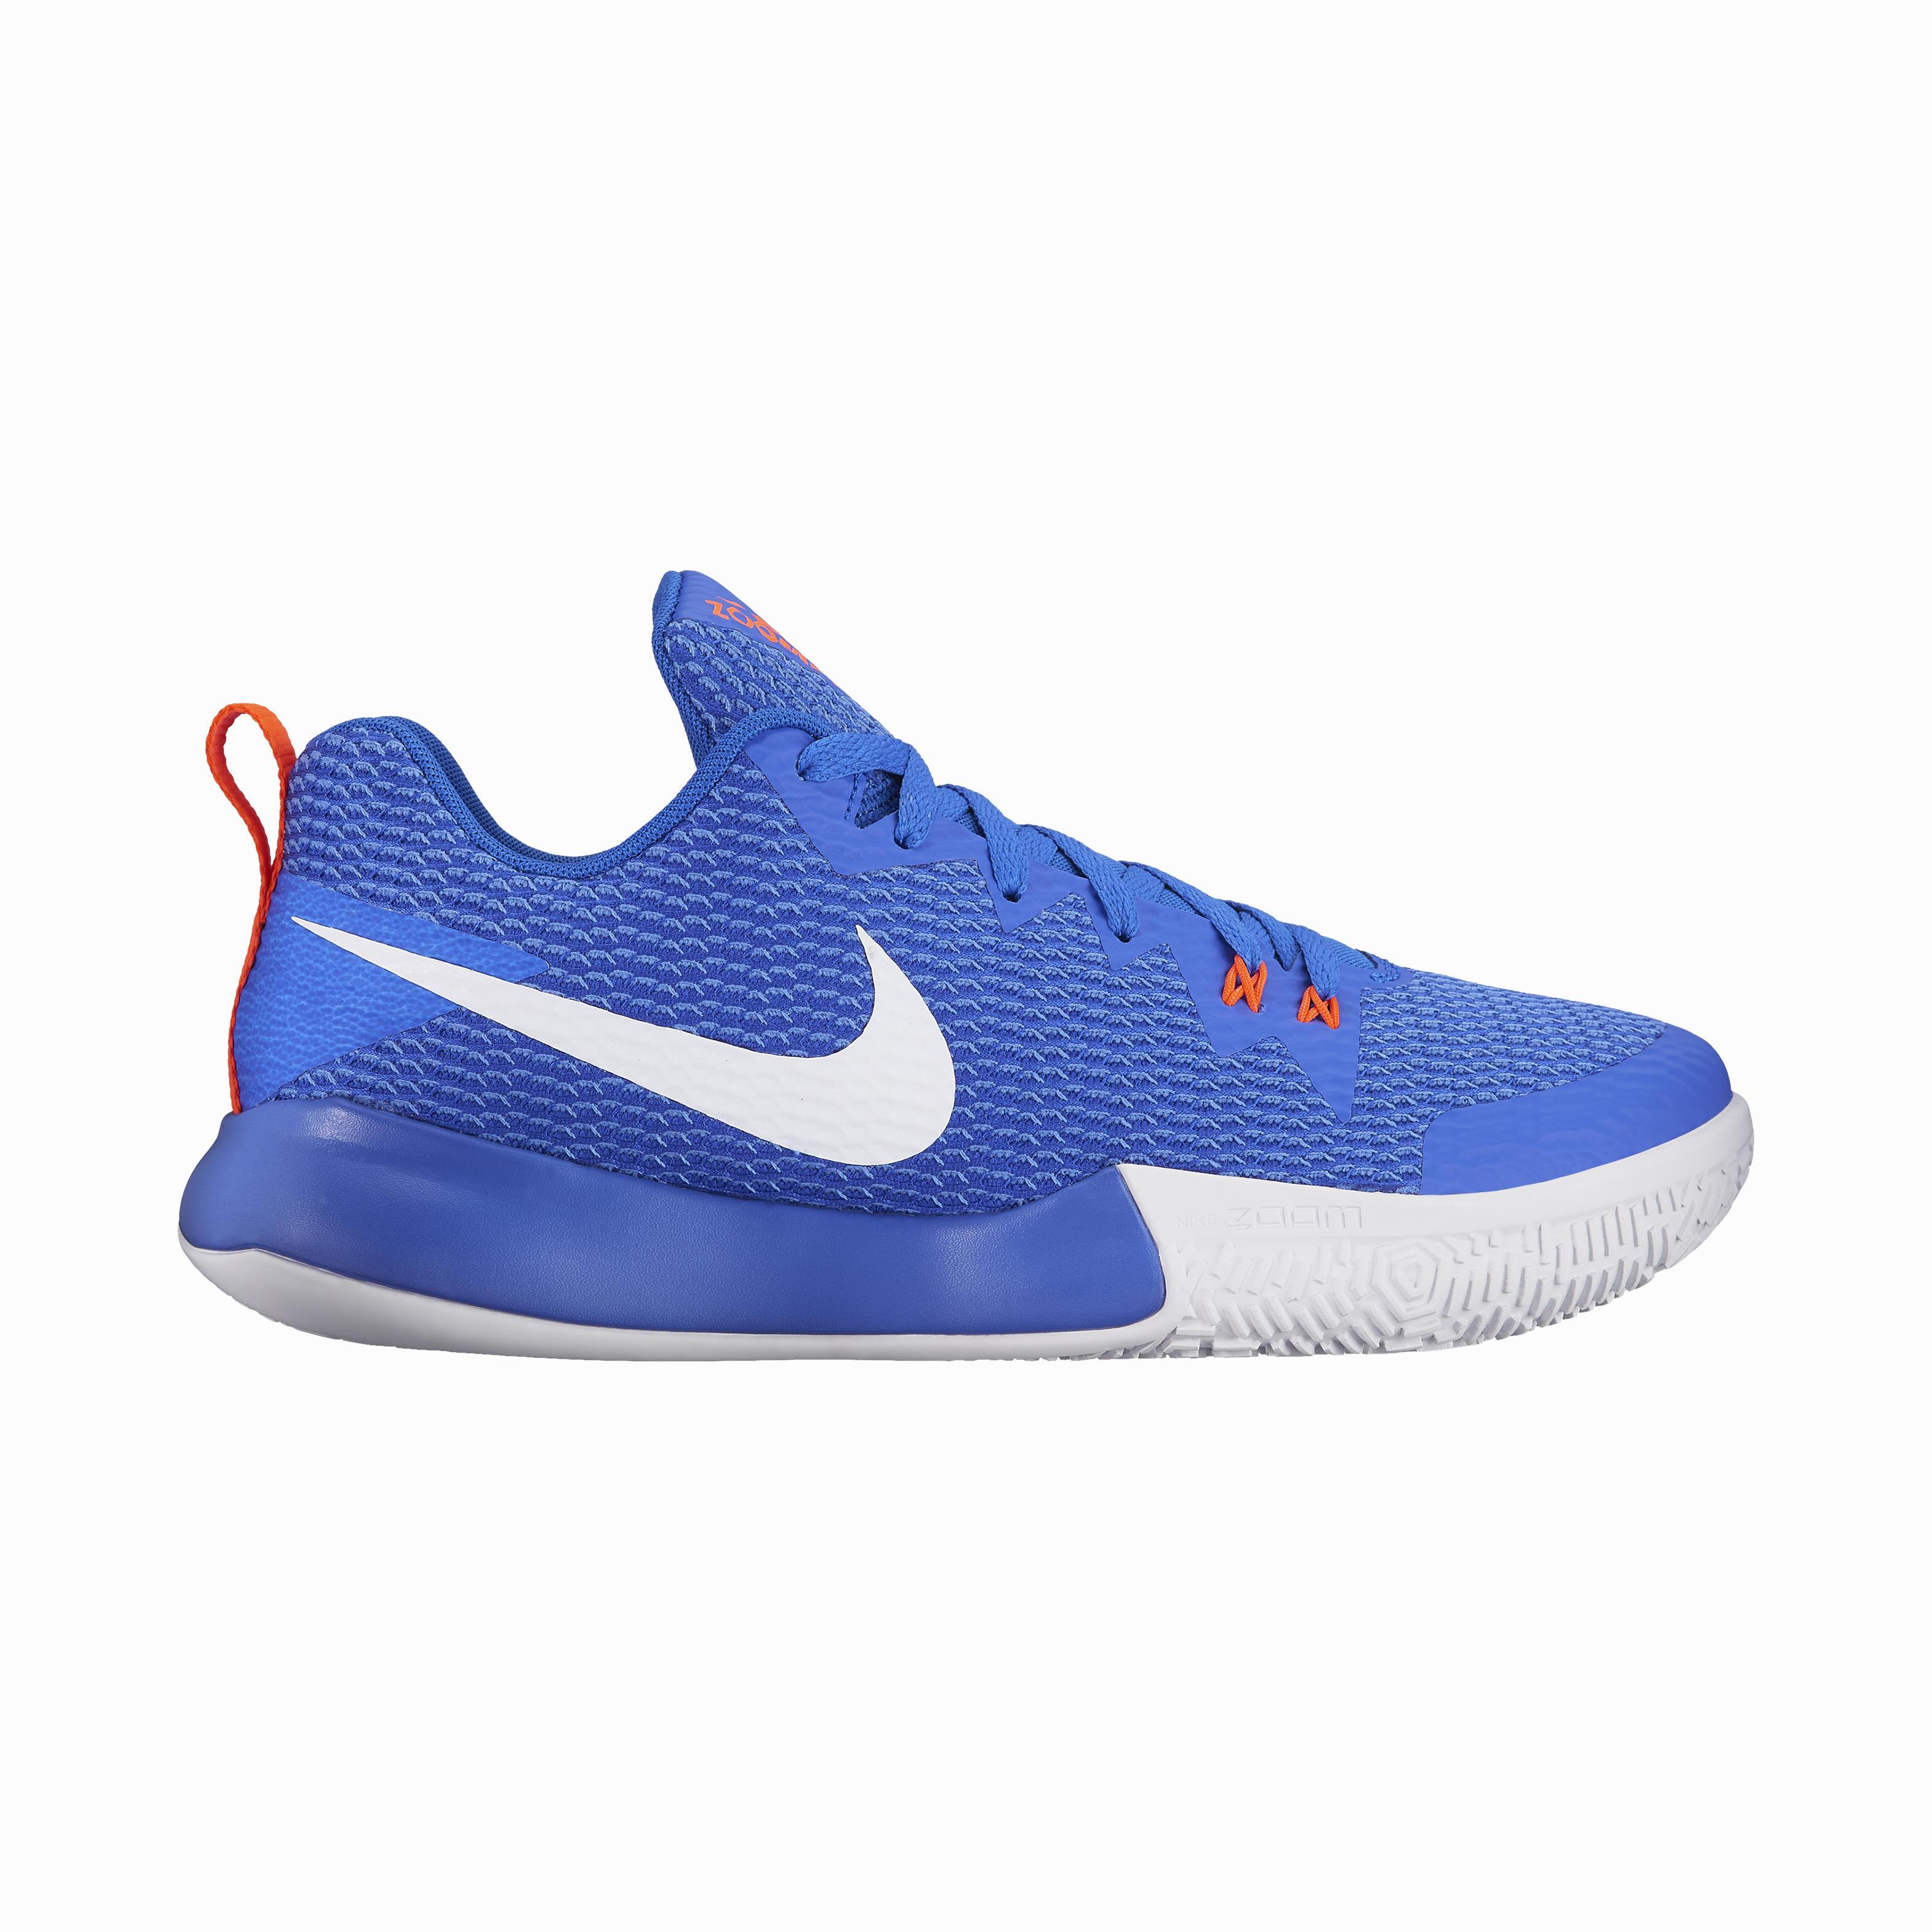 Bleu De Zoom Nike Chaussure Adulte Live Ii Basket uwPkXZTOi